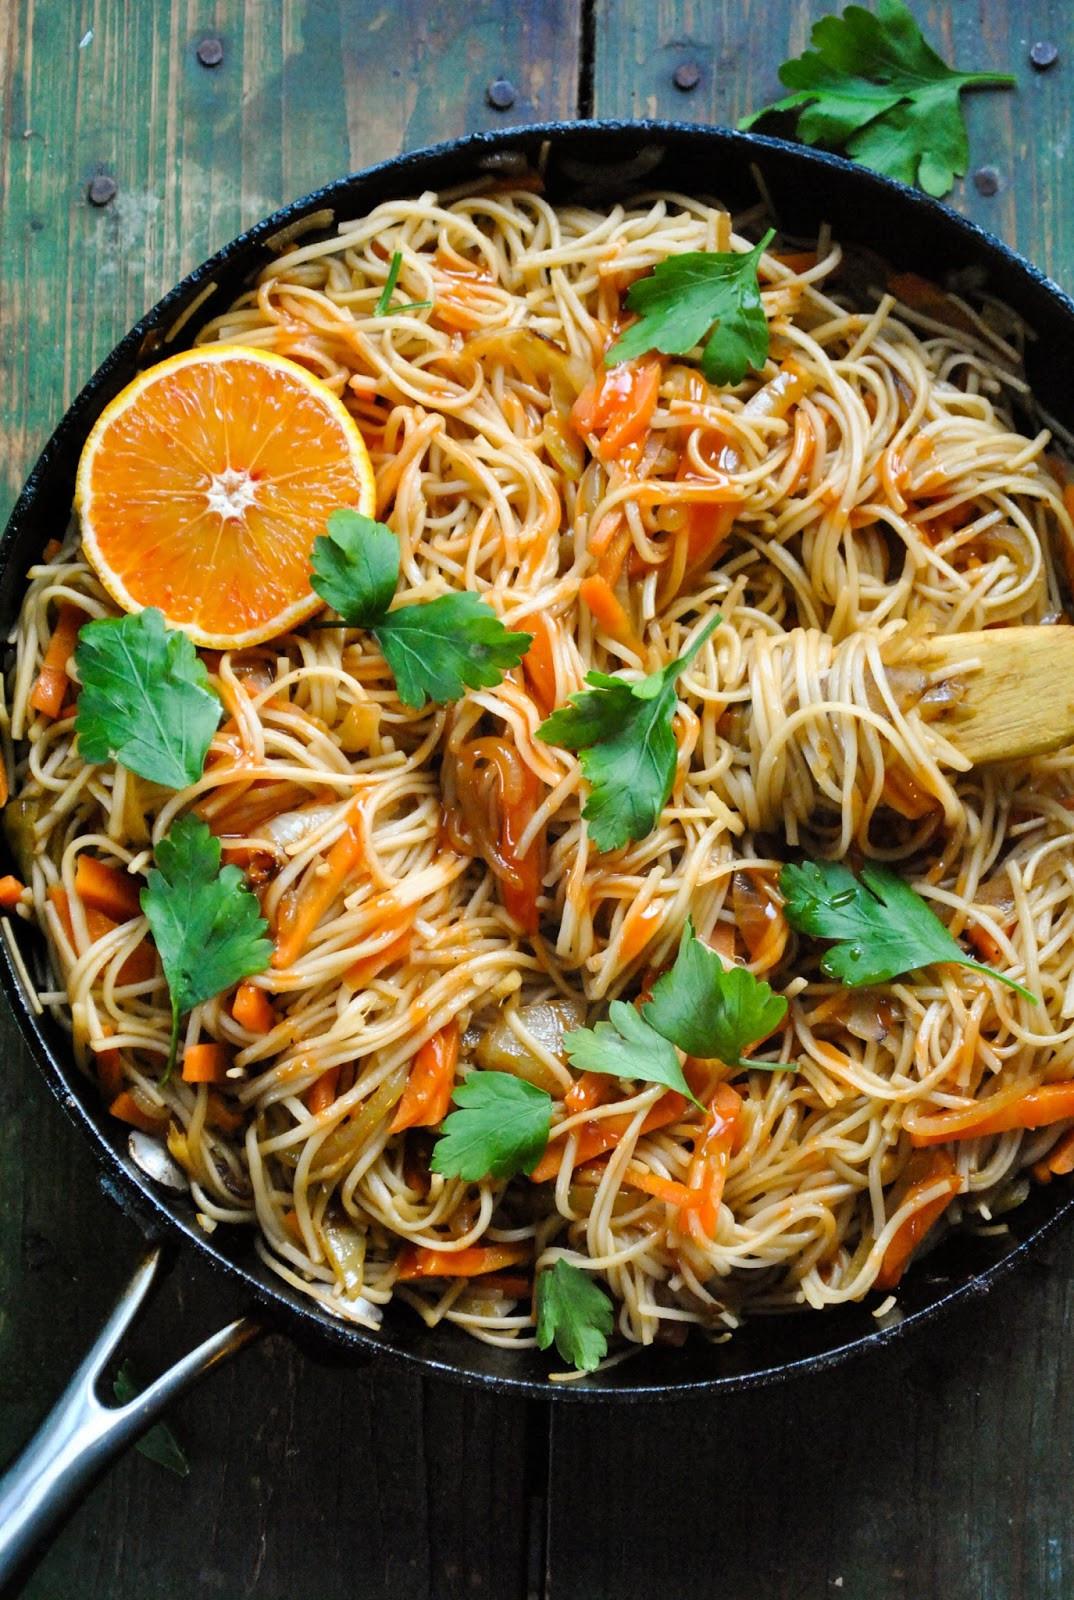 Easy Vegan Recipes For Beginners Simple  15 delicious vegan recipes for beginners VeganSandra